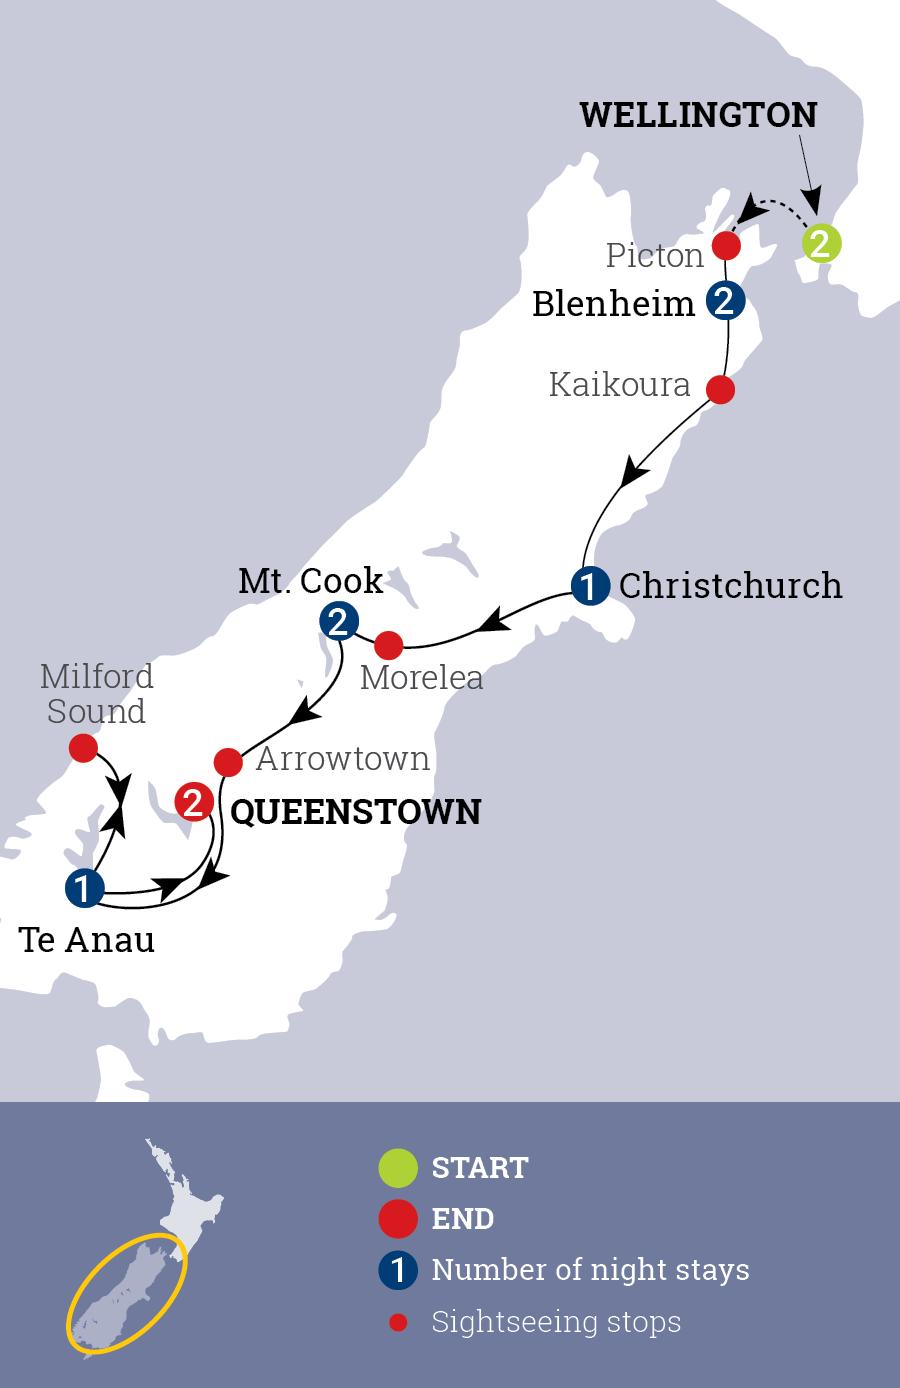 Sensational South Map